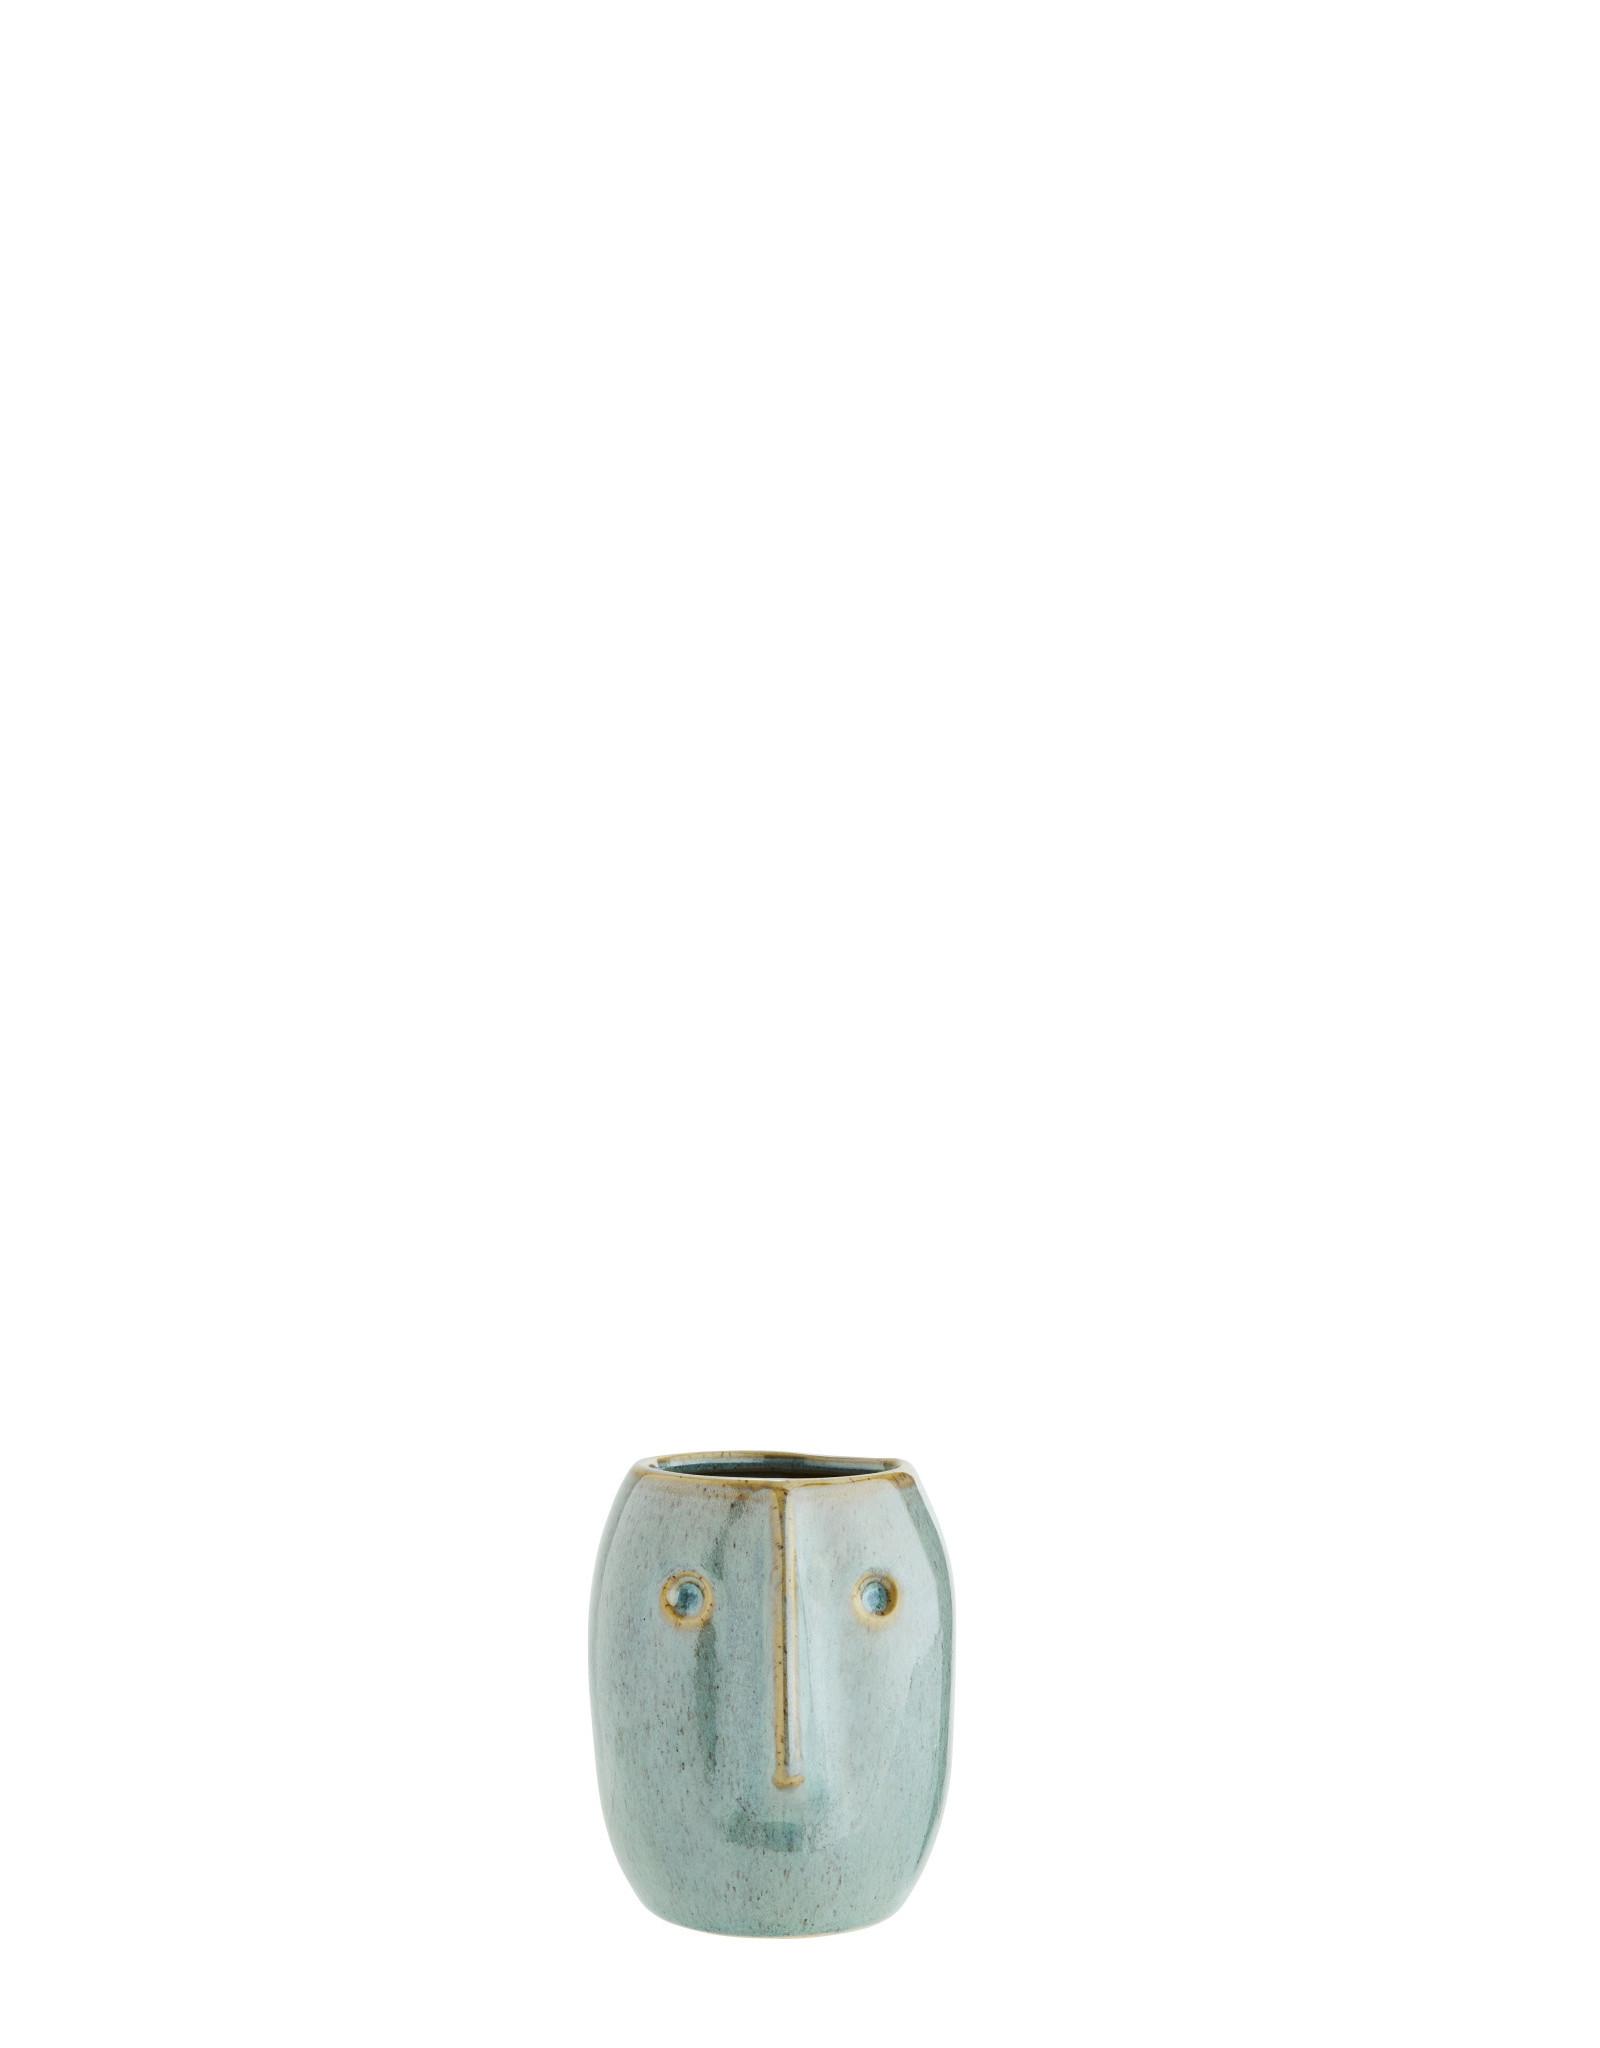 Madam Stolz Bloempot met gezicht - licht groen, naturel - Ø 8 x H 10  cm | Rond